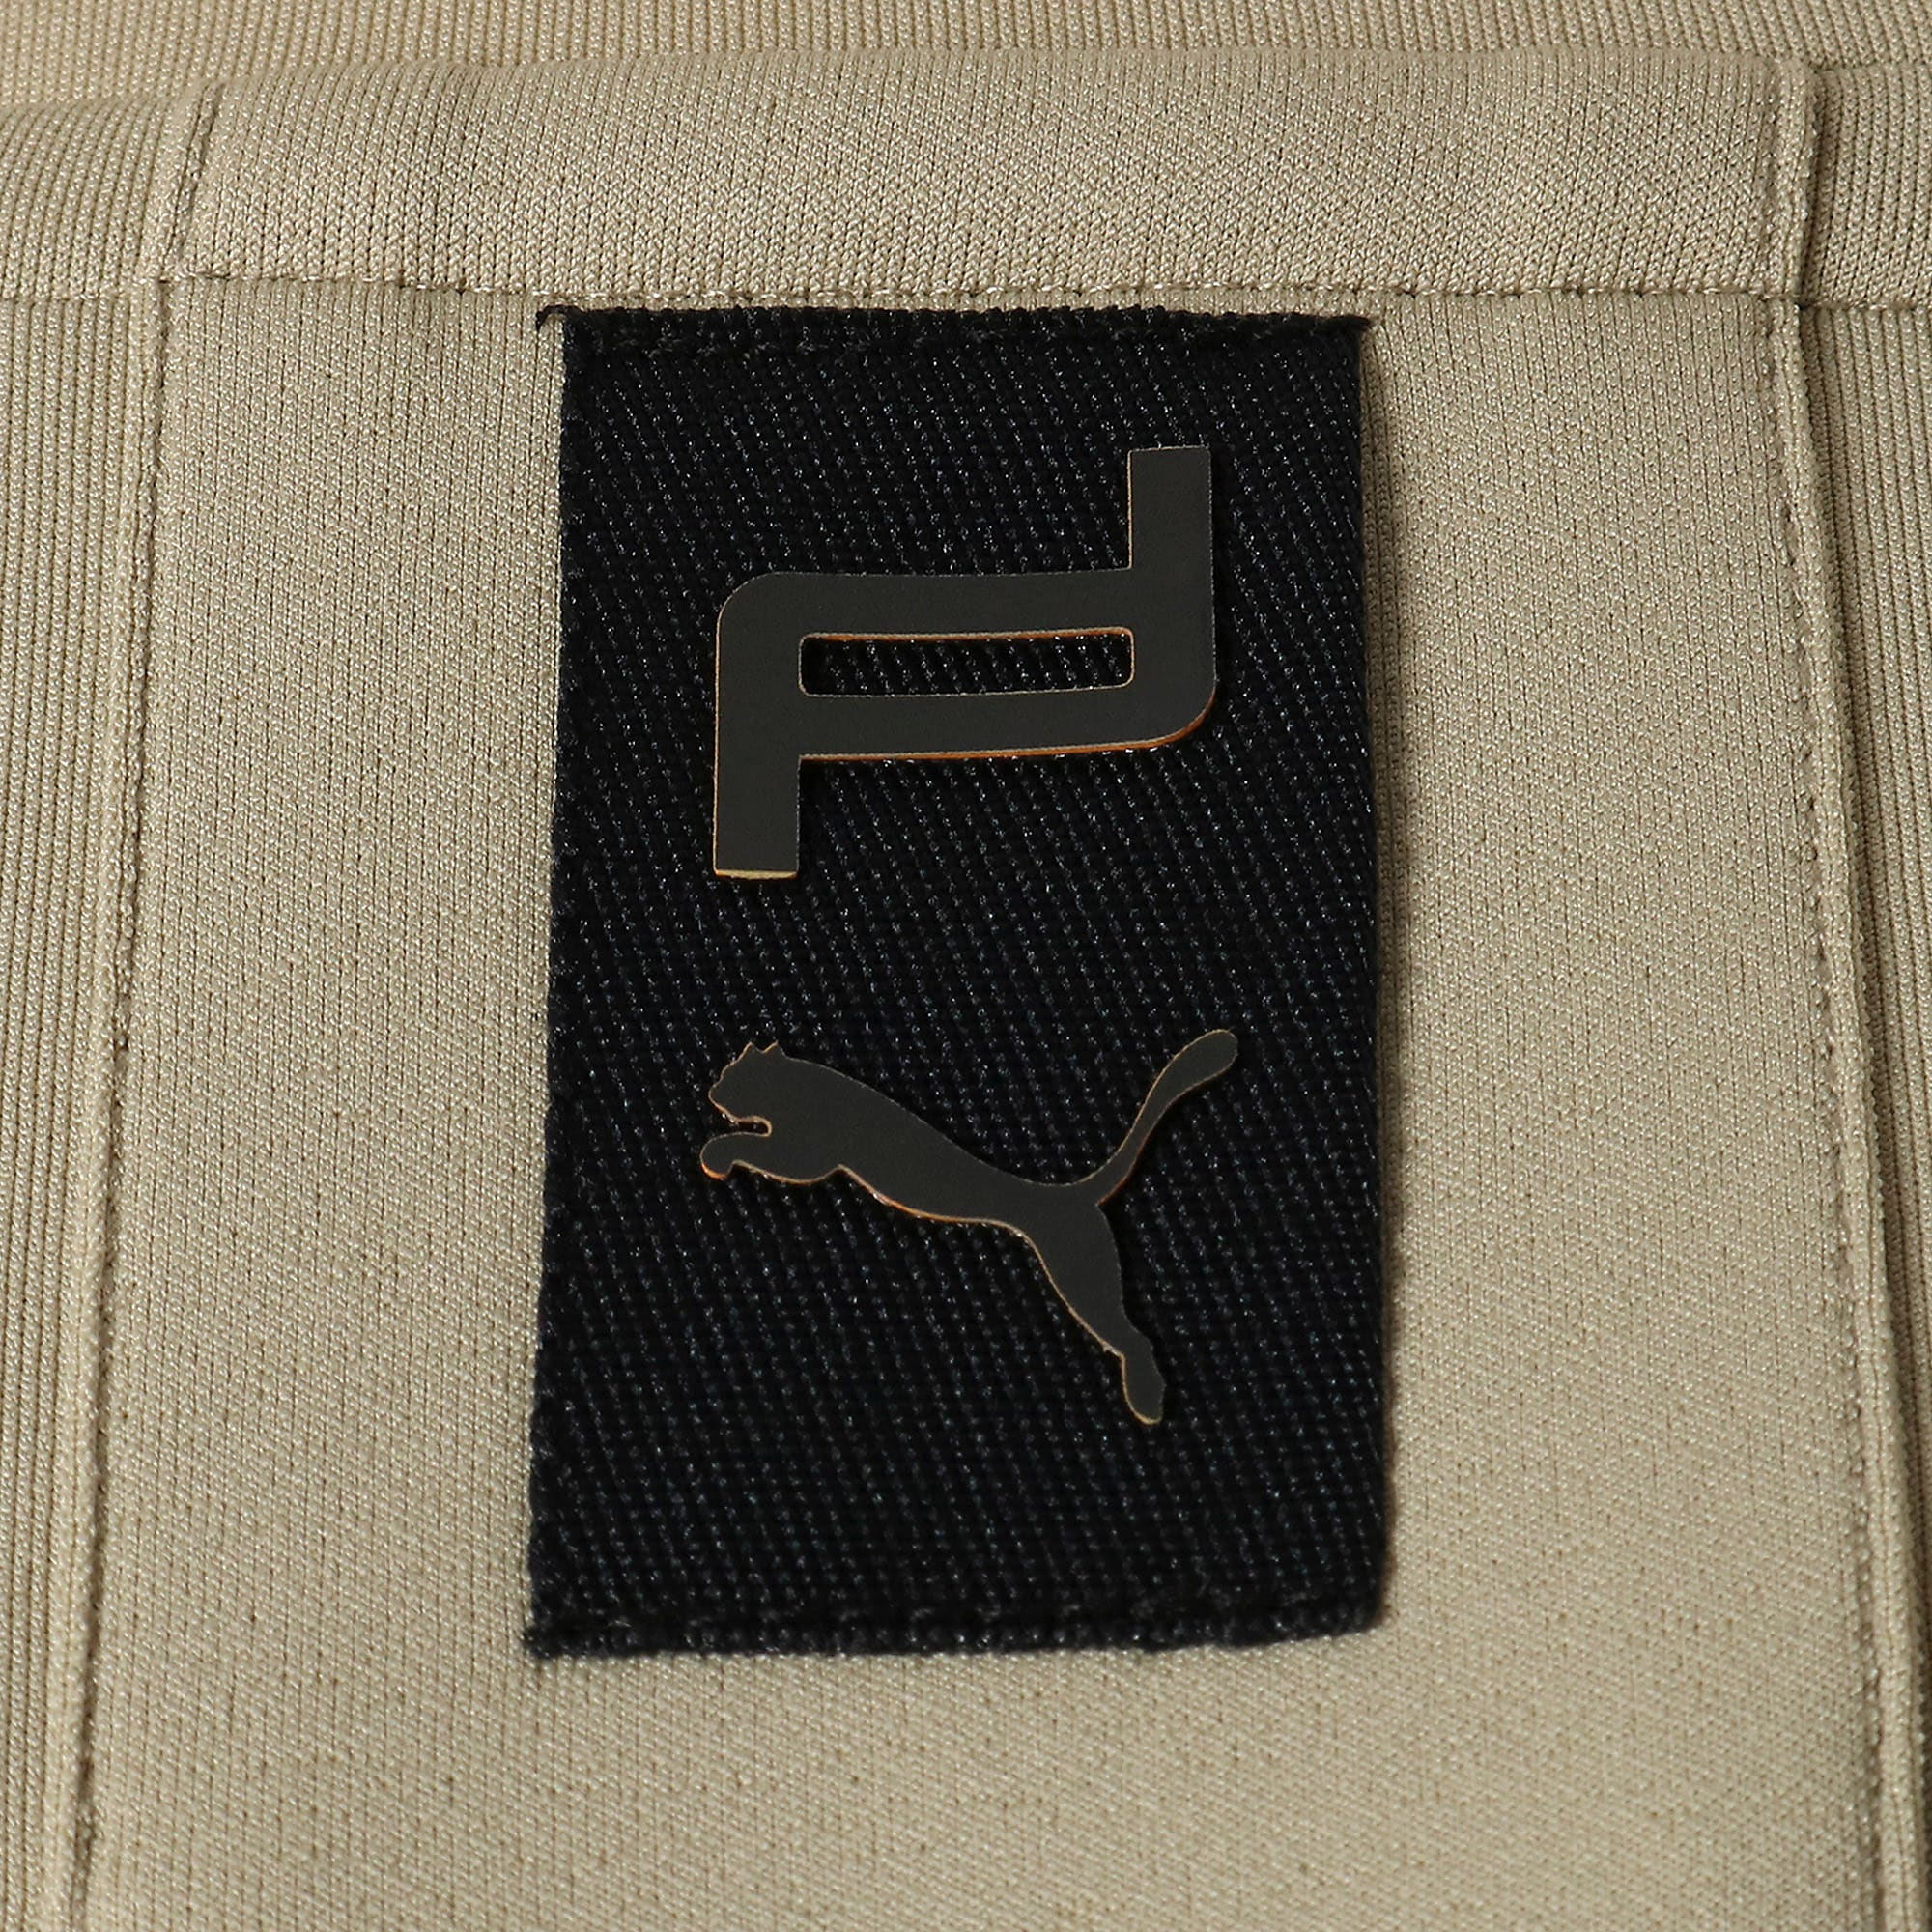 Thumbnail 8 of PORSCHE DESIGN  フーデッドミッドレイヤー, Elm, medium-JPN